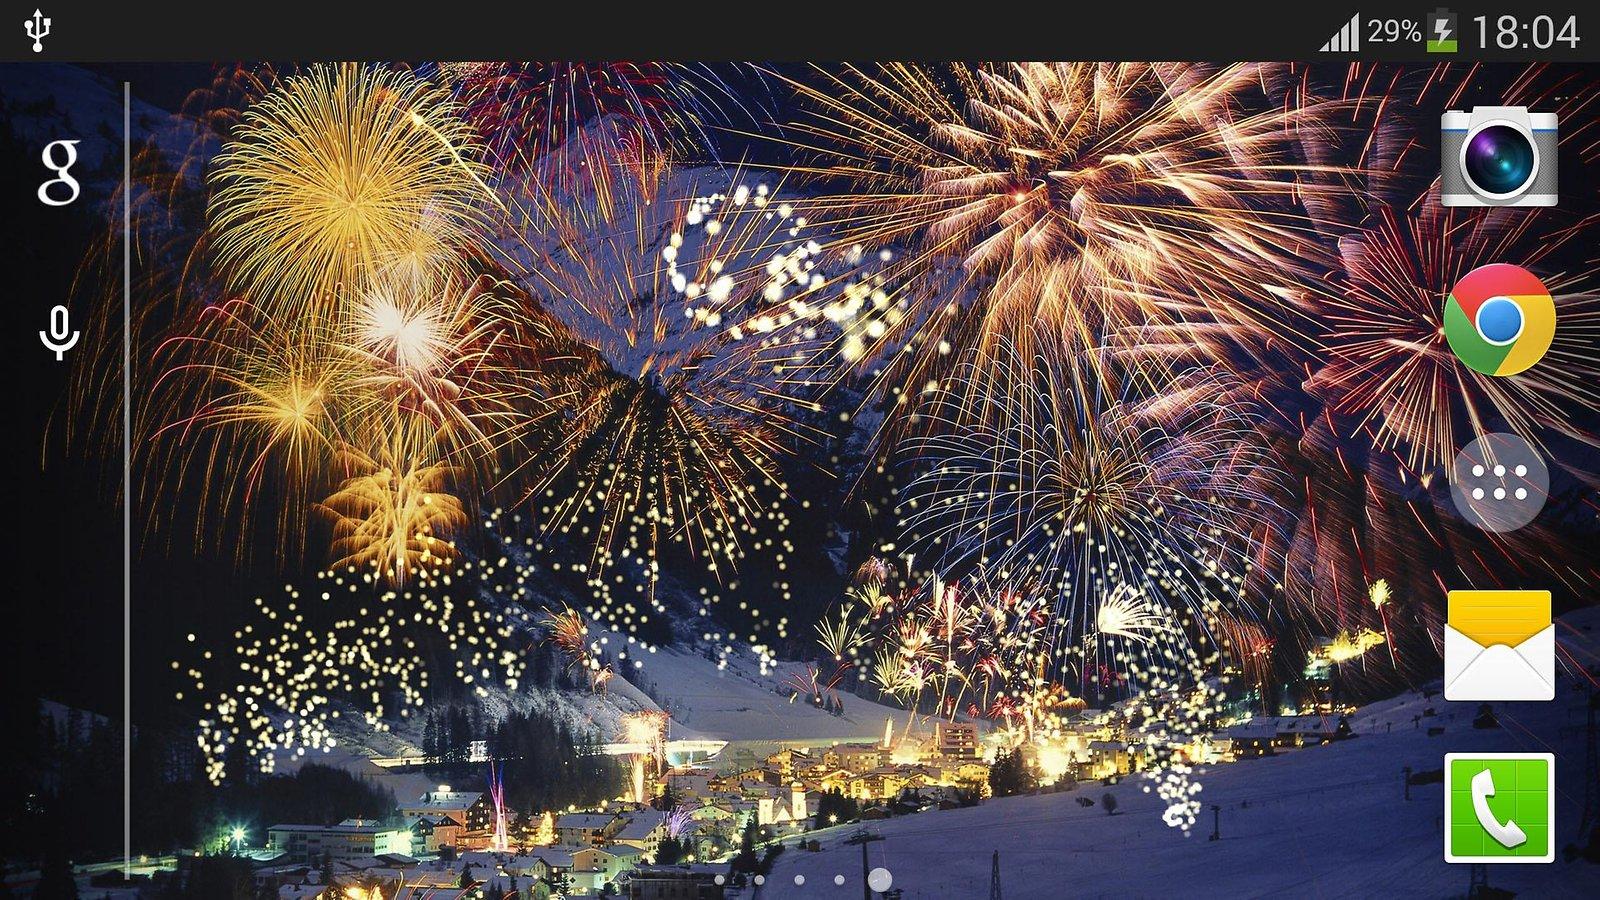 Fireworks Live Wallpaper - WallpaperSafari